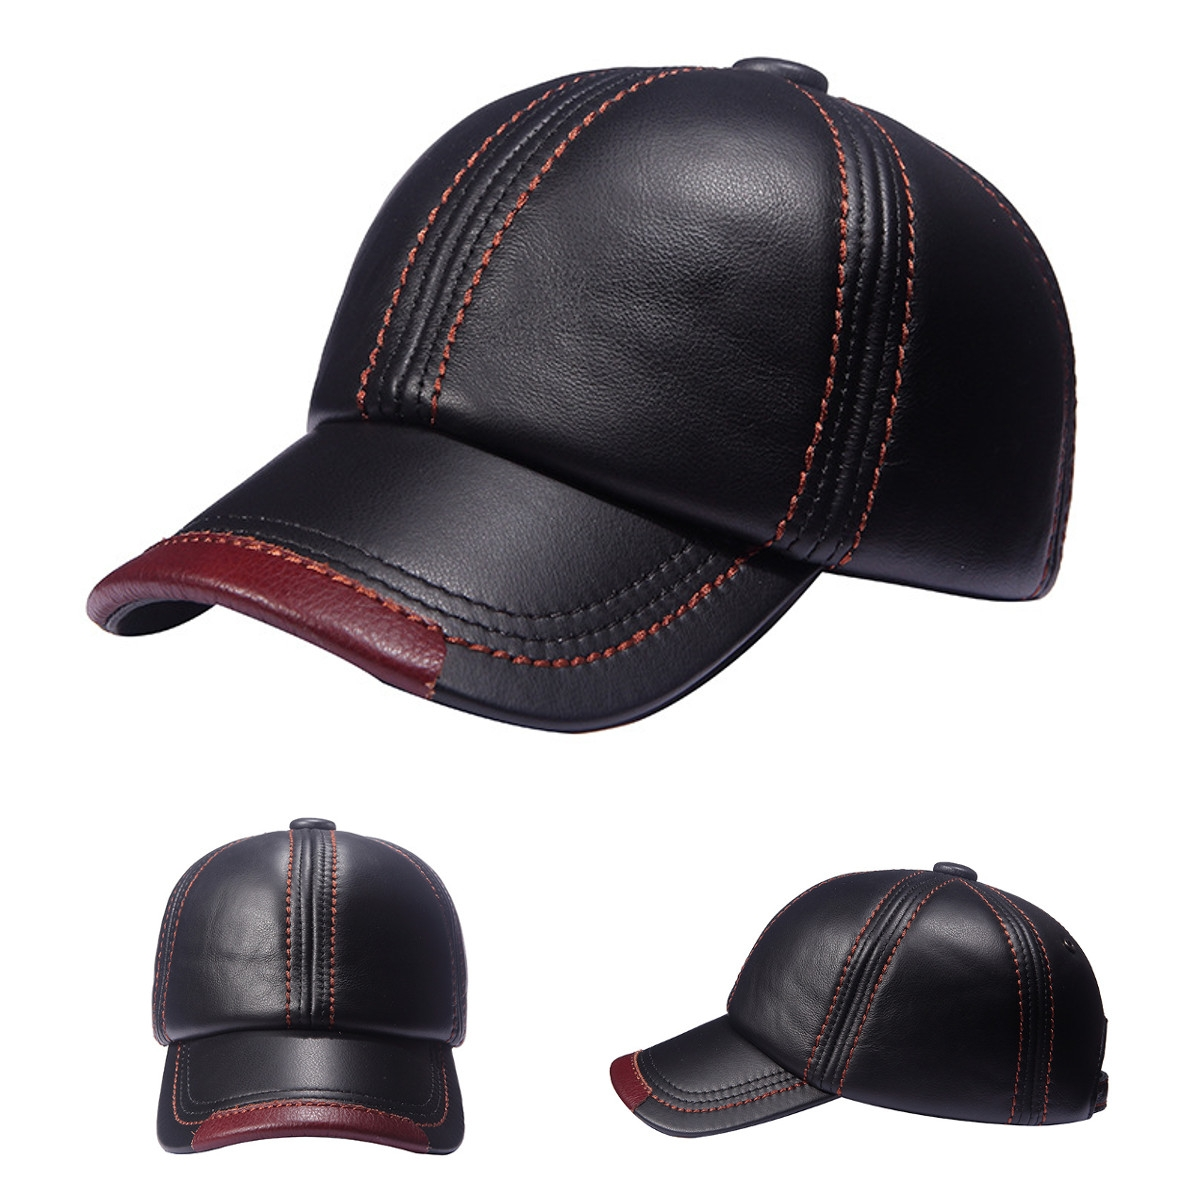 3fde6e3760b Men s PU Leather Baseball Cap Metal Buckle Outdoor Warm Adjustable Snapback  Hats Black Normal  Product No  907368. Item specifics  Seller SKU SKU775856  ...